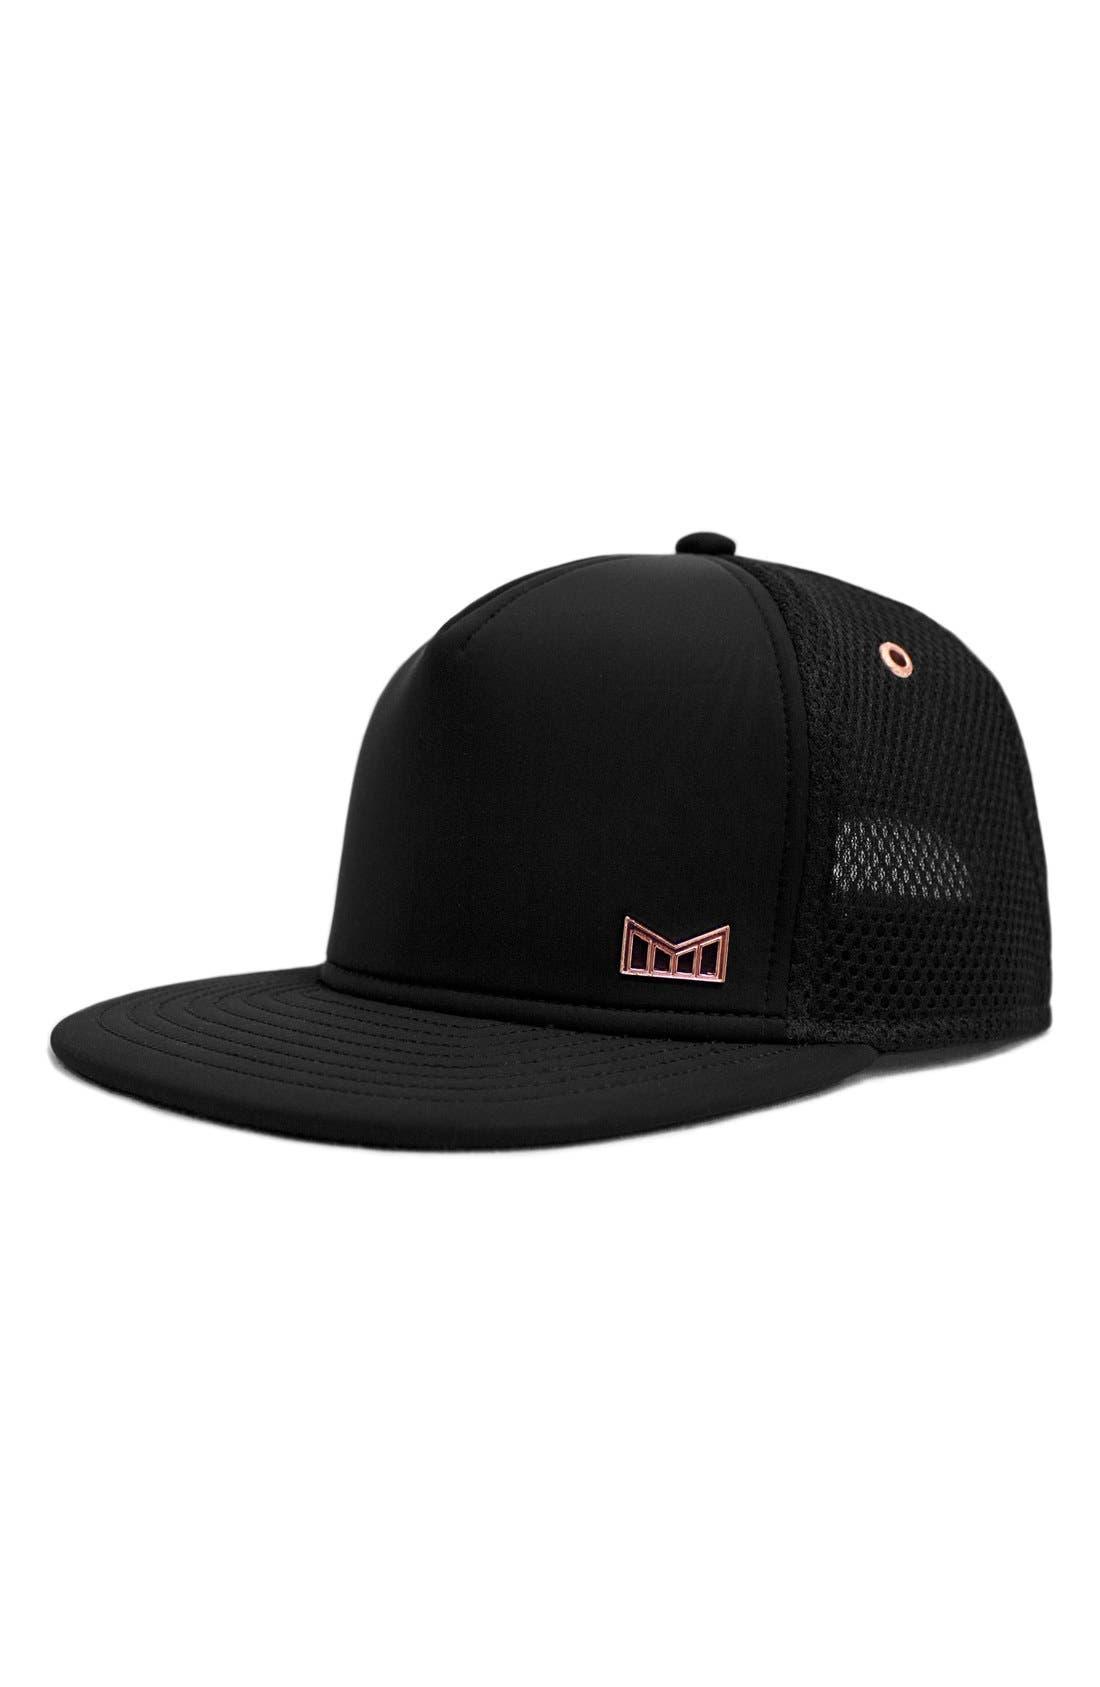 'The Majesty' Mesh Back Snapback Hat,                         Main,                         color, Black